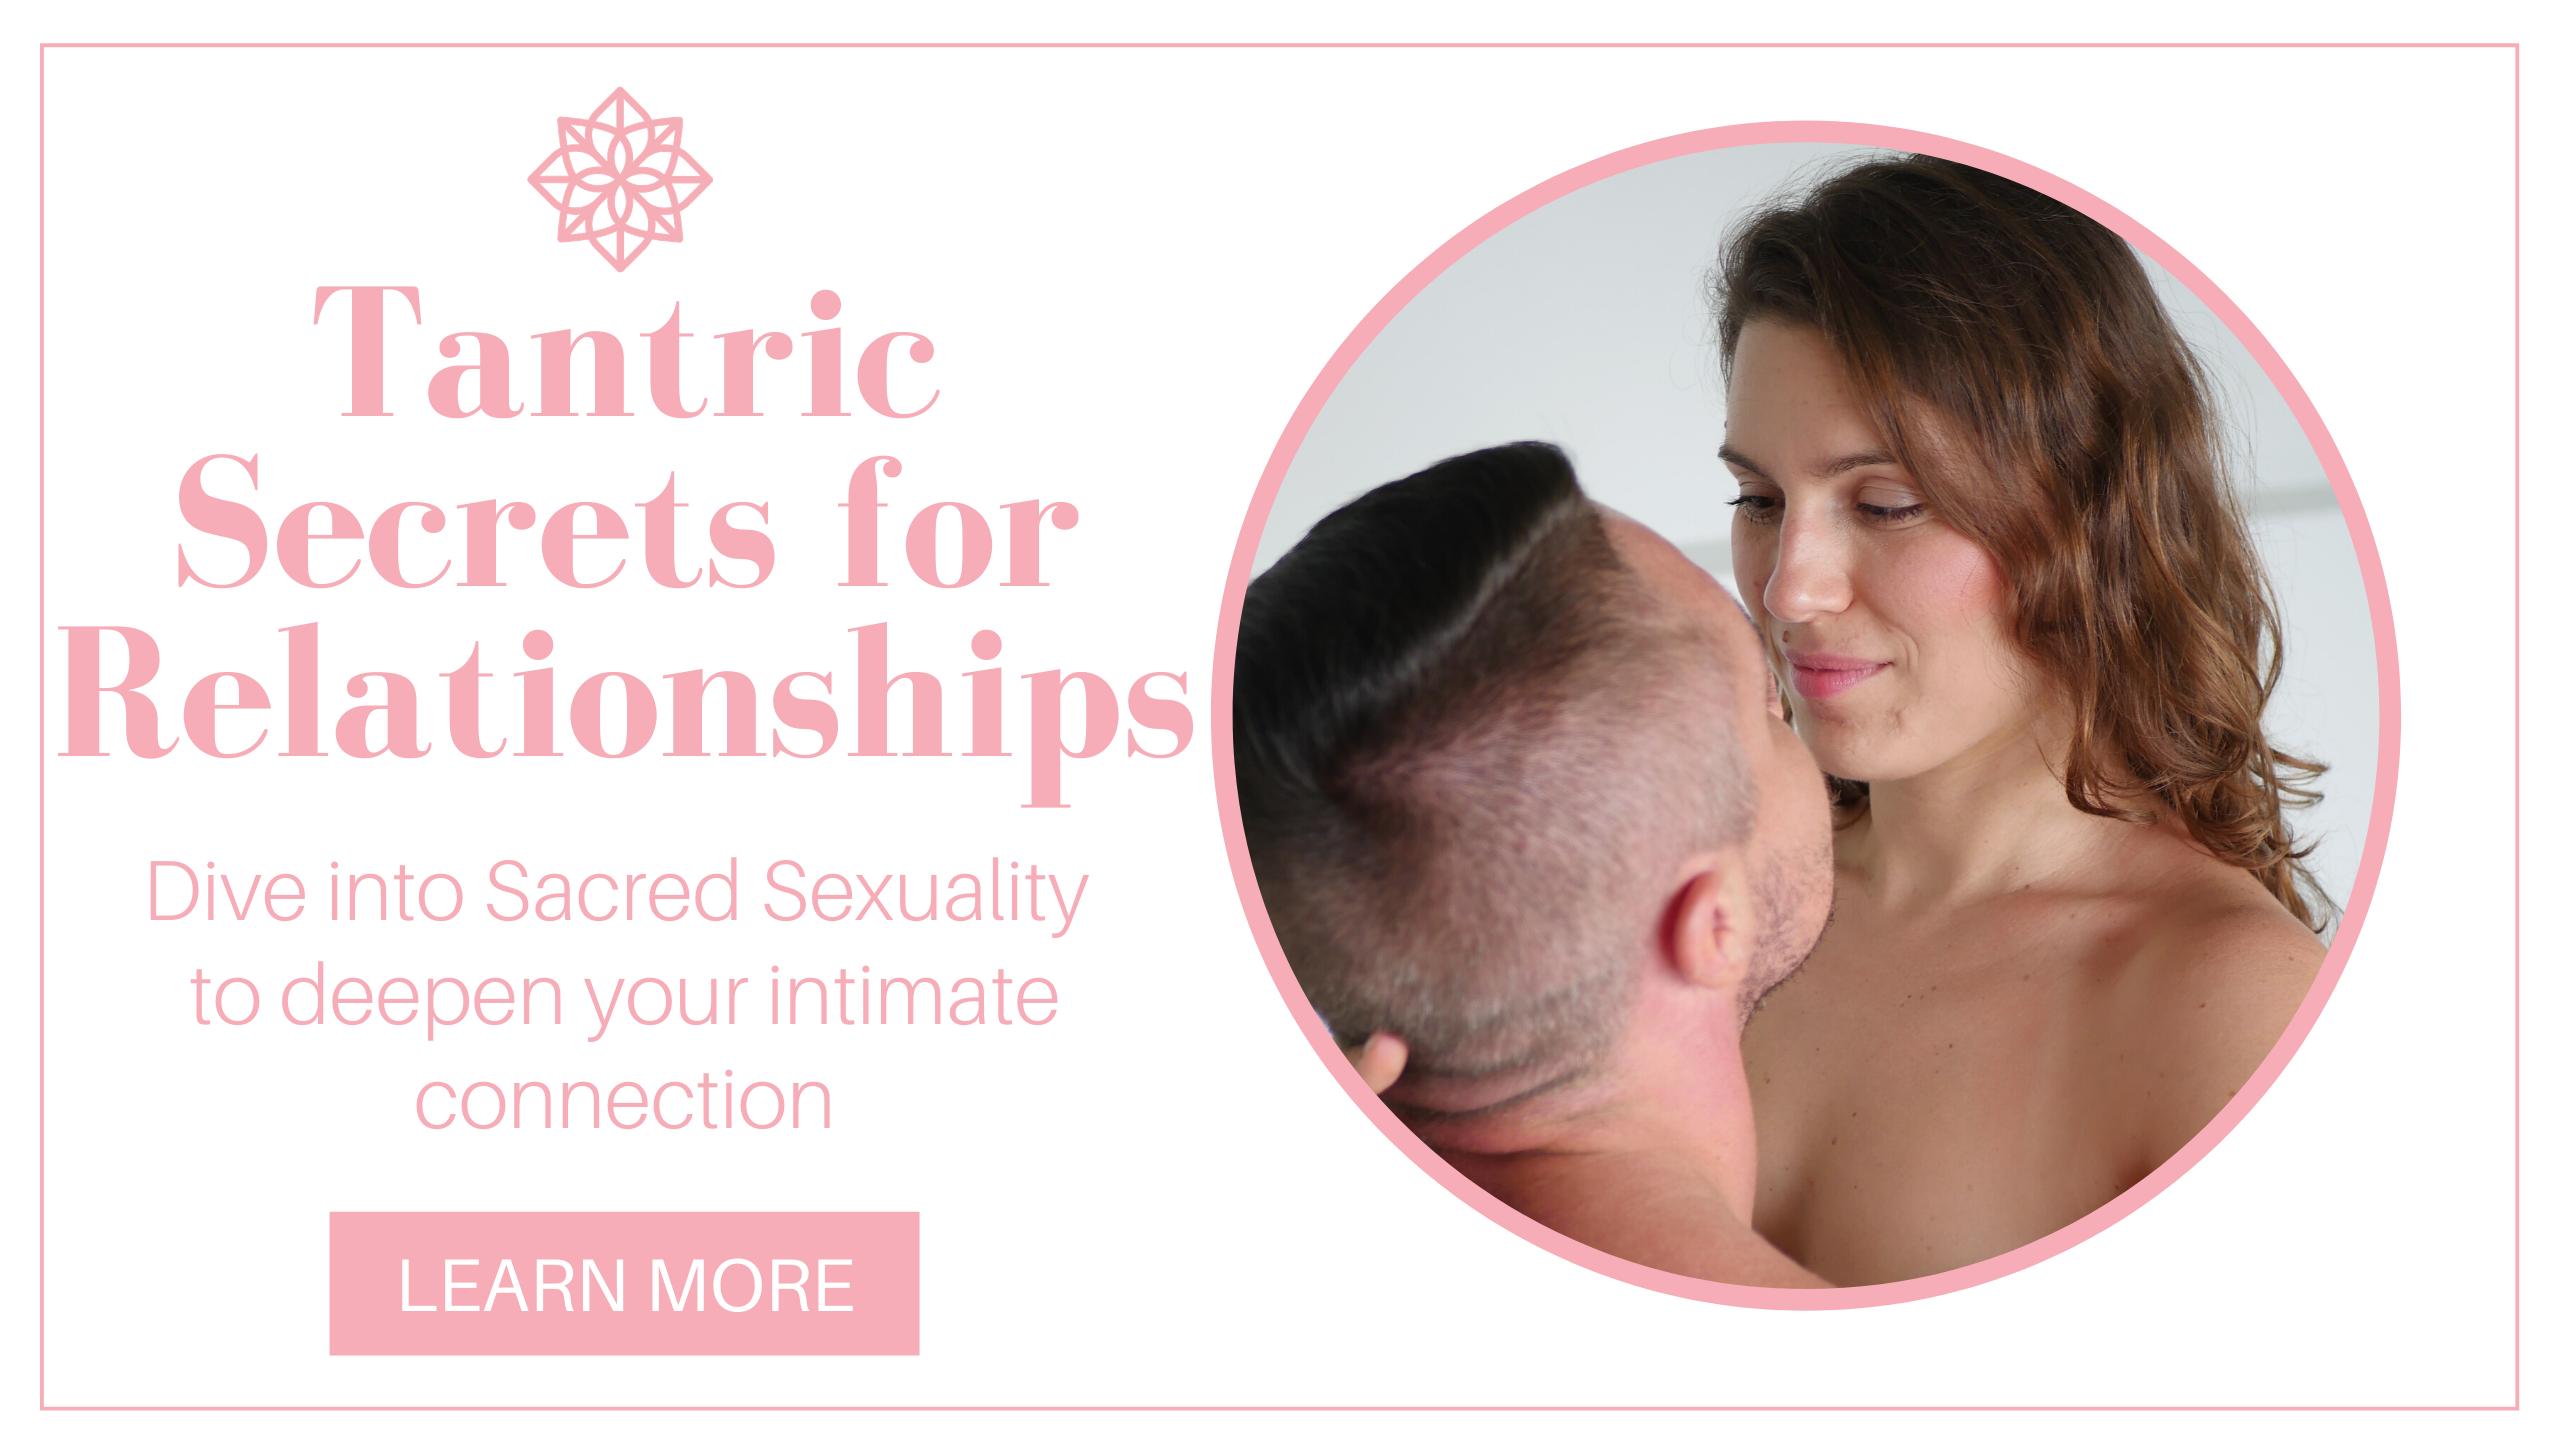 Tantric Secrets for Relationships - online program for couples